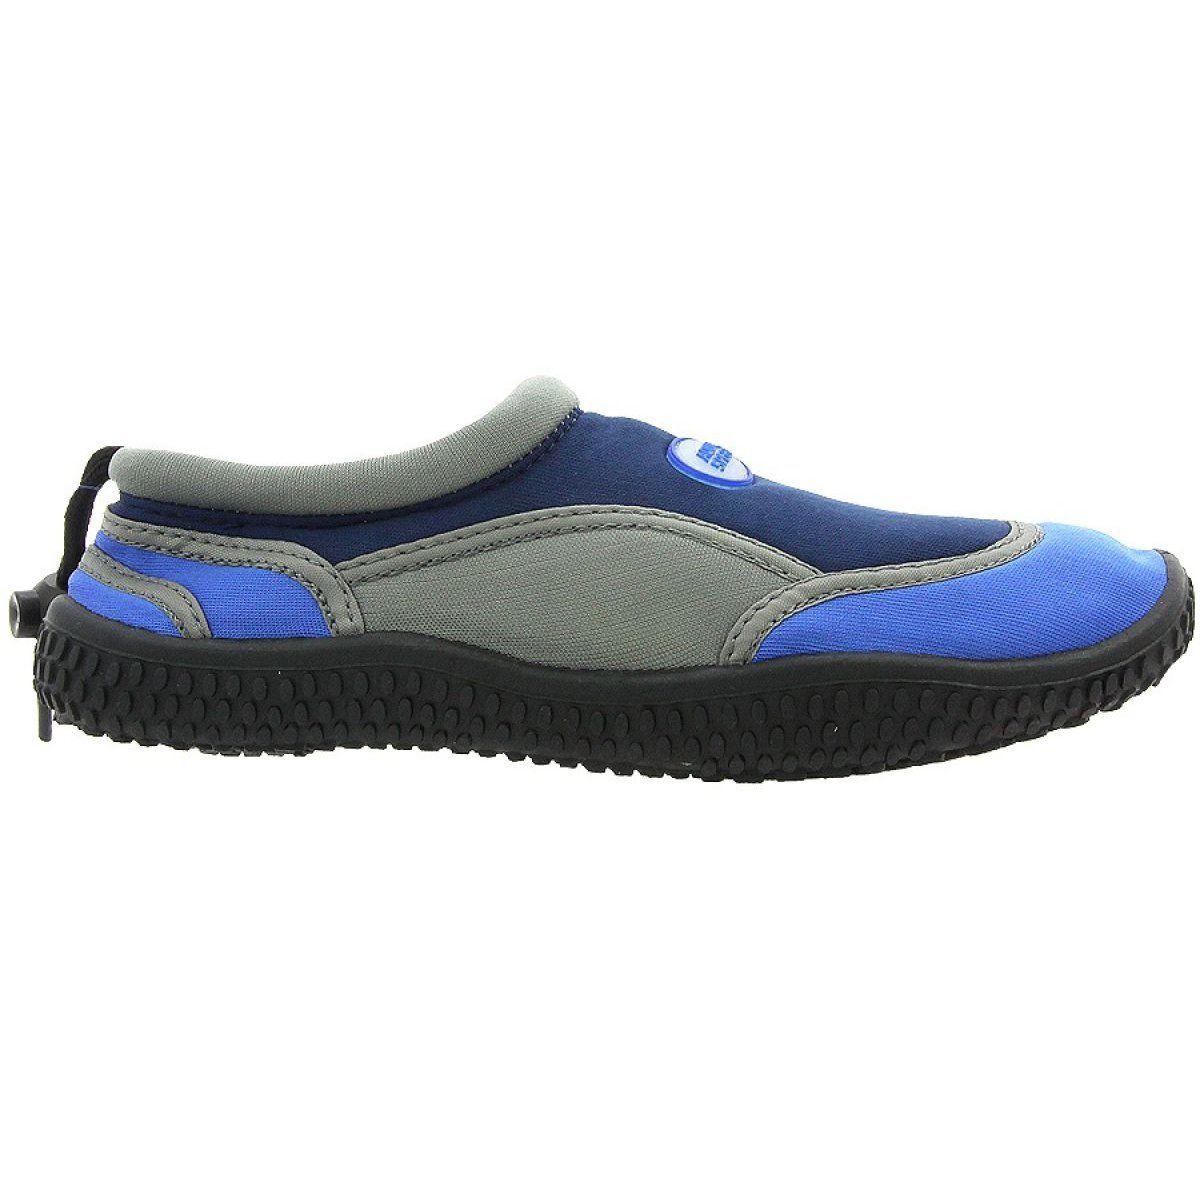 Aqua Speed Jr Neoprene Beach Shoes Navy Gray Multicolored Beach Shoes Shoes Neoprene